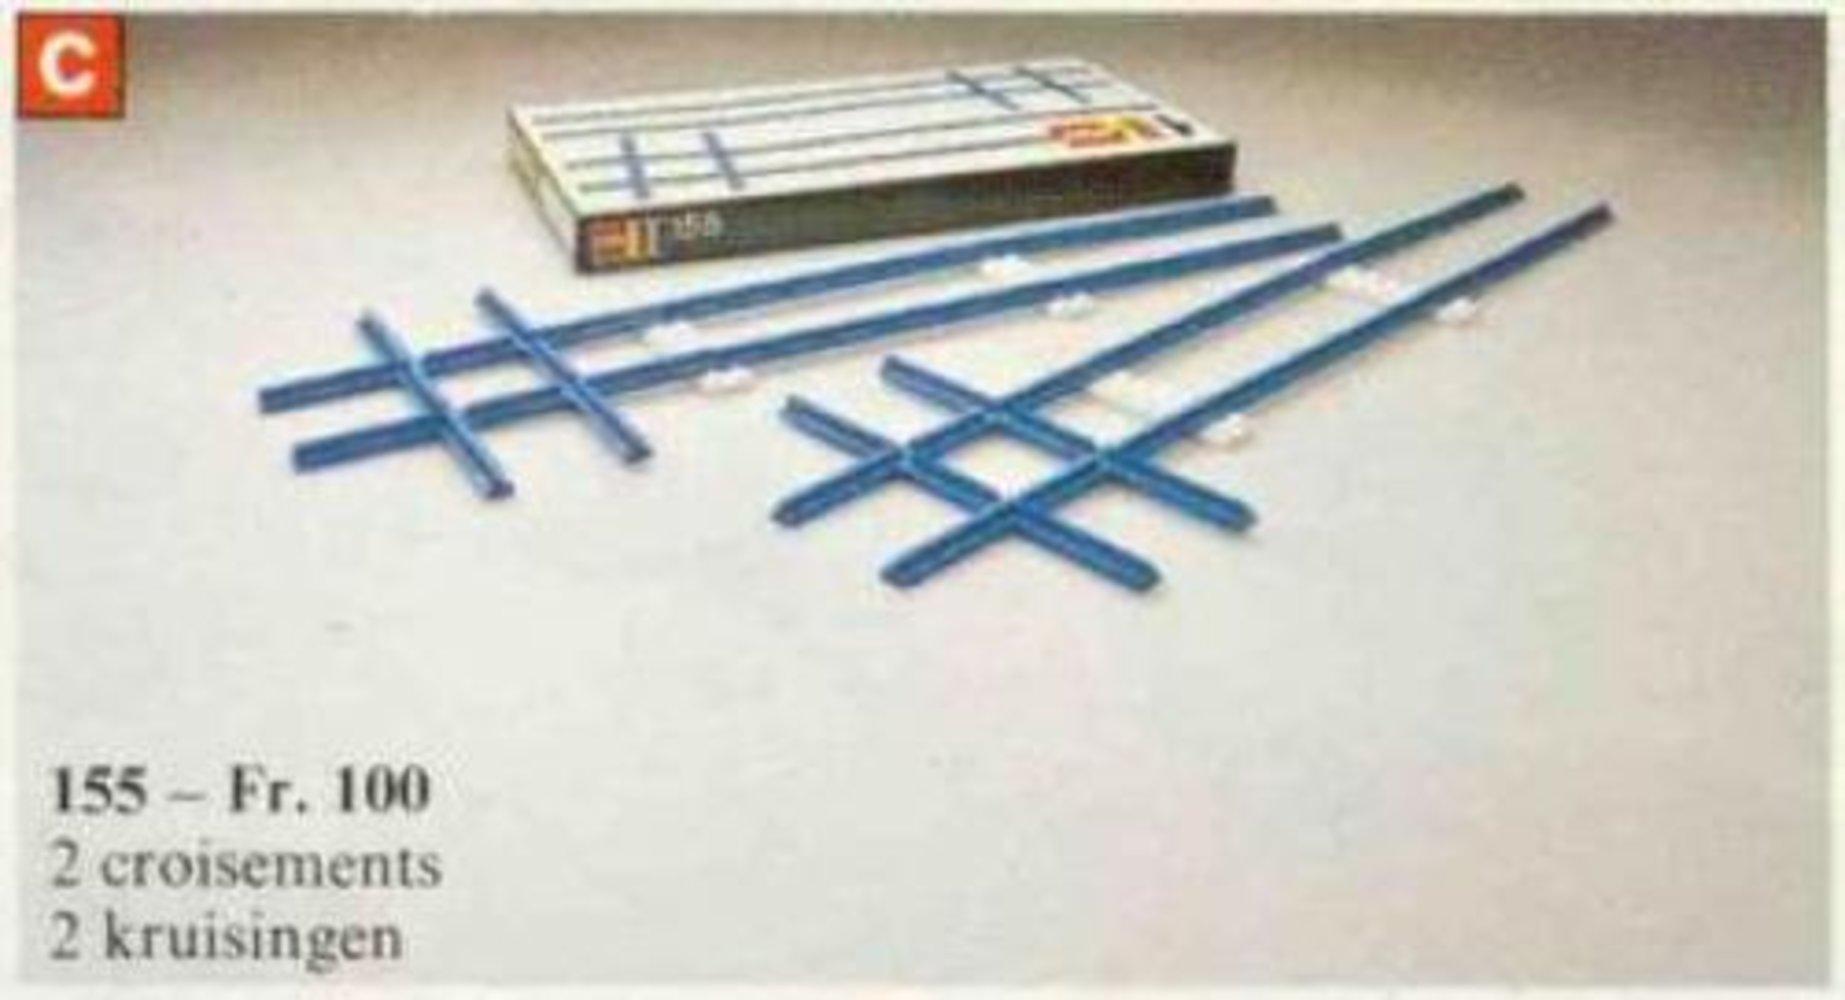 2 Cross Rails, 8 Straight Tracks, 4 Base Plates